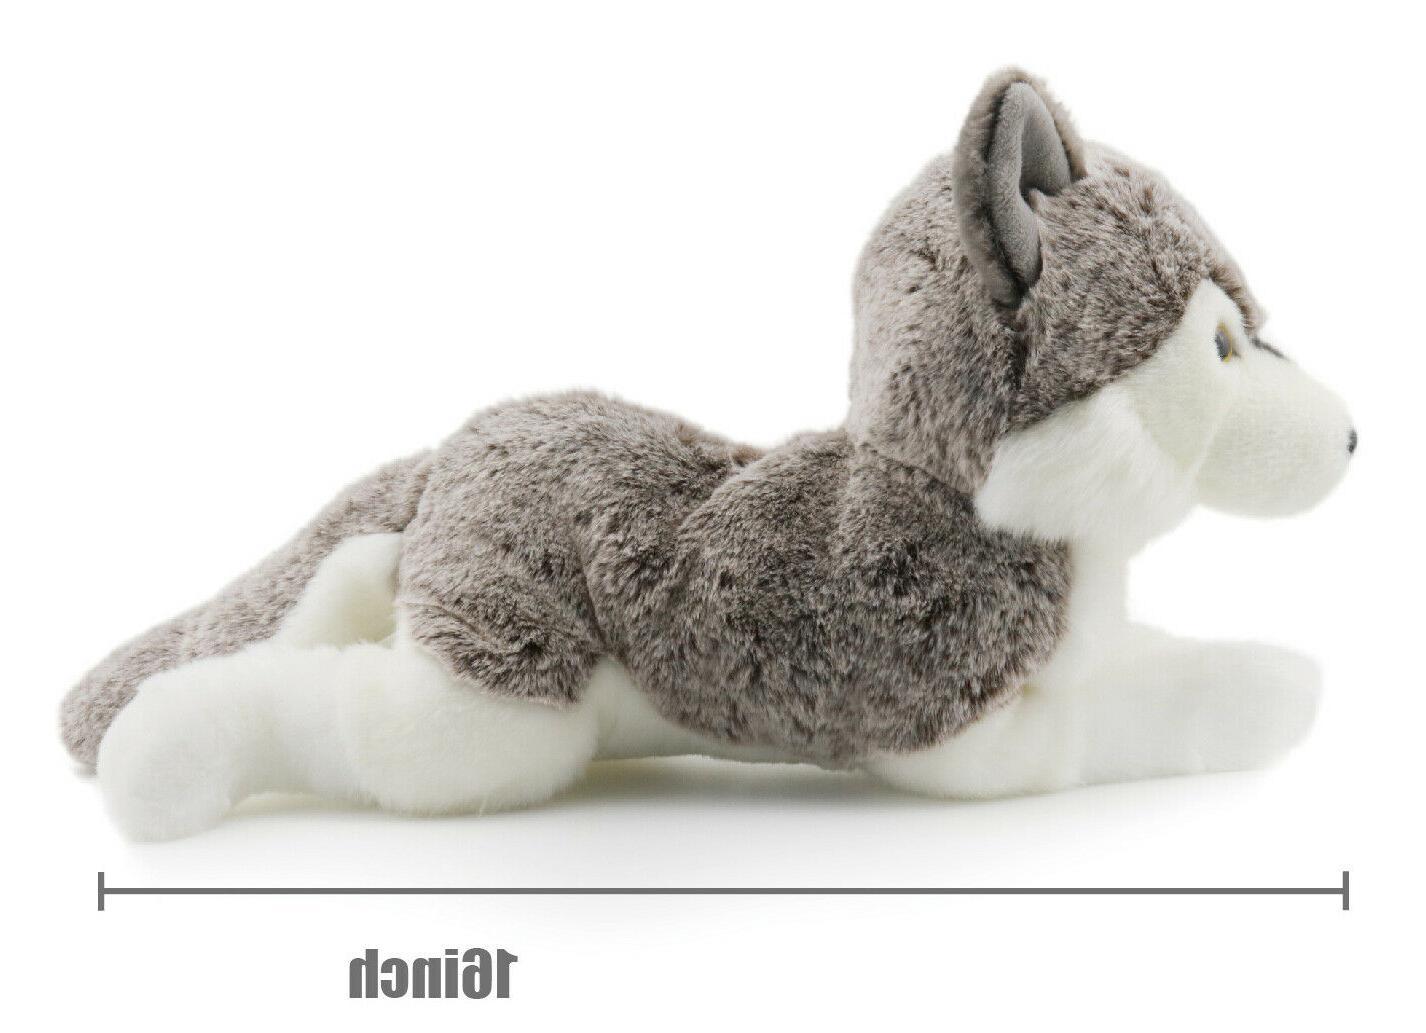 Lifelike Siberian Stuffed Animal Plush 16 Inches - KING BEAR